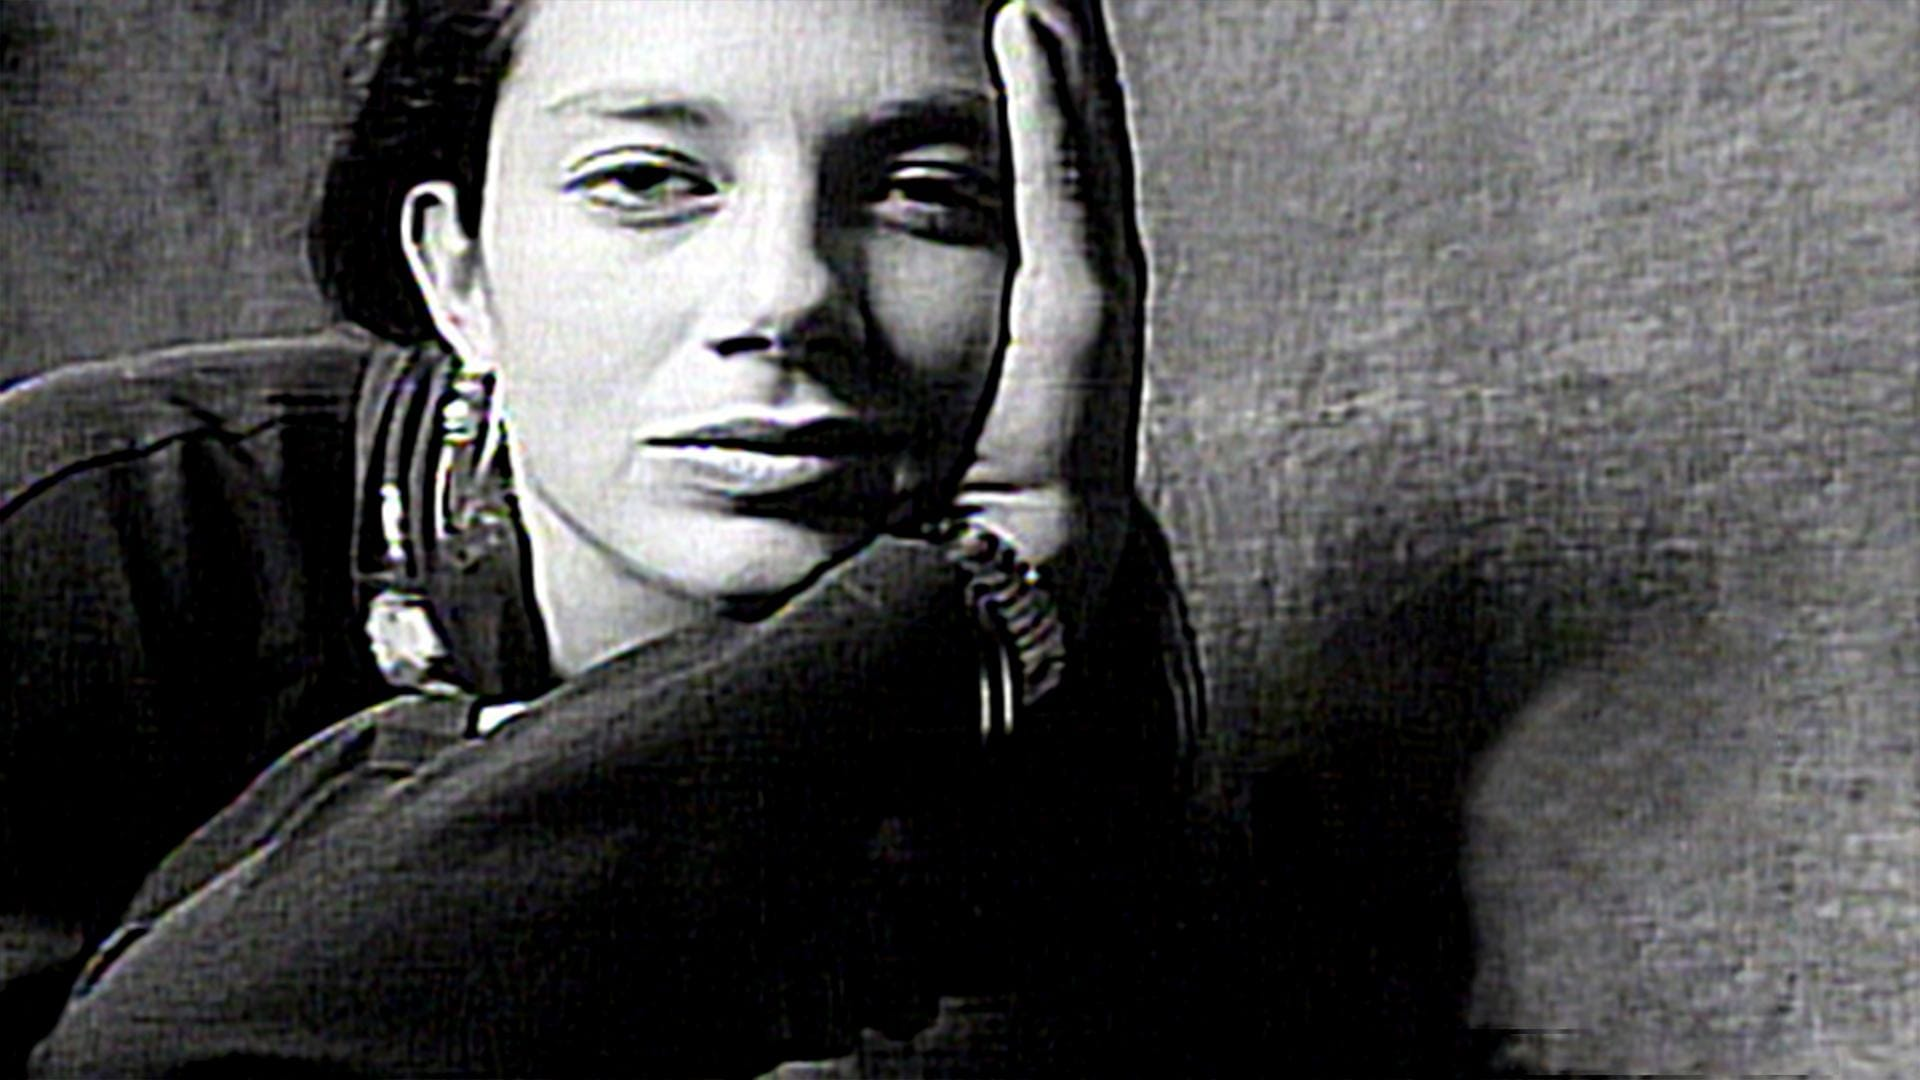 Justine Bateman: February 13, 1988